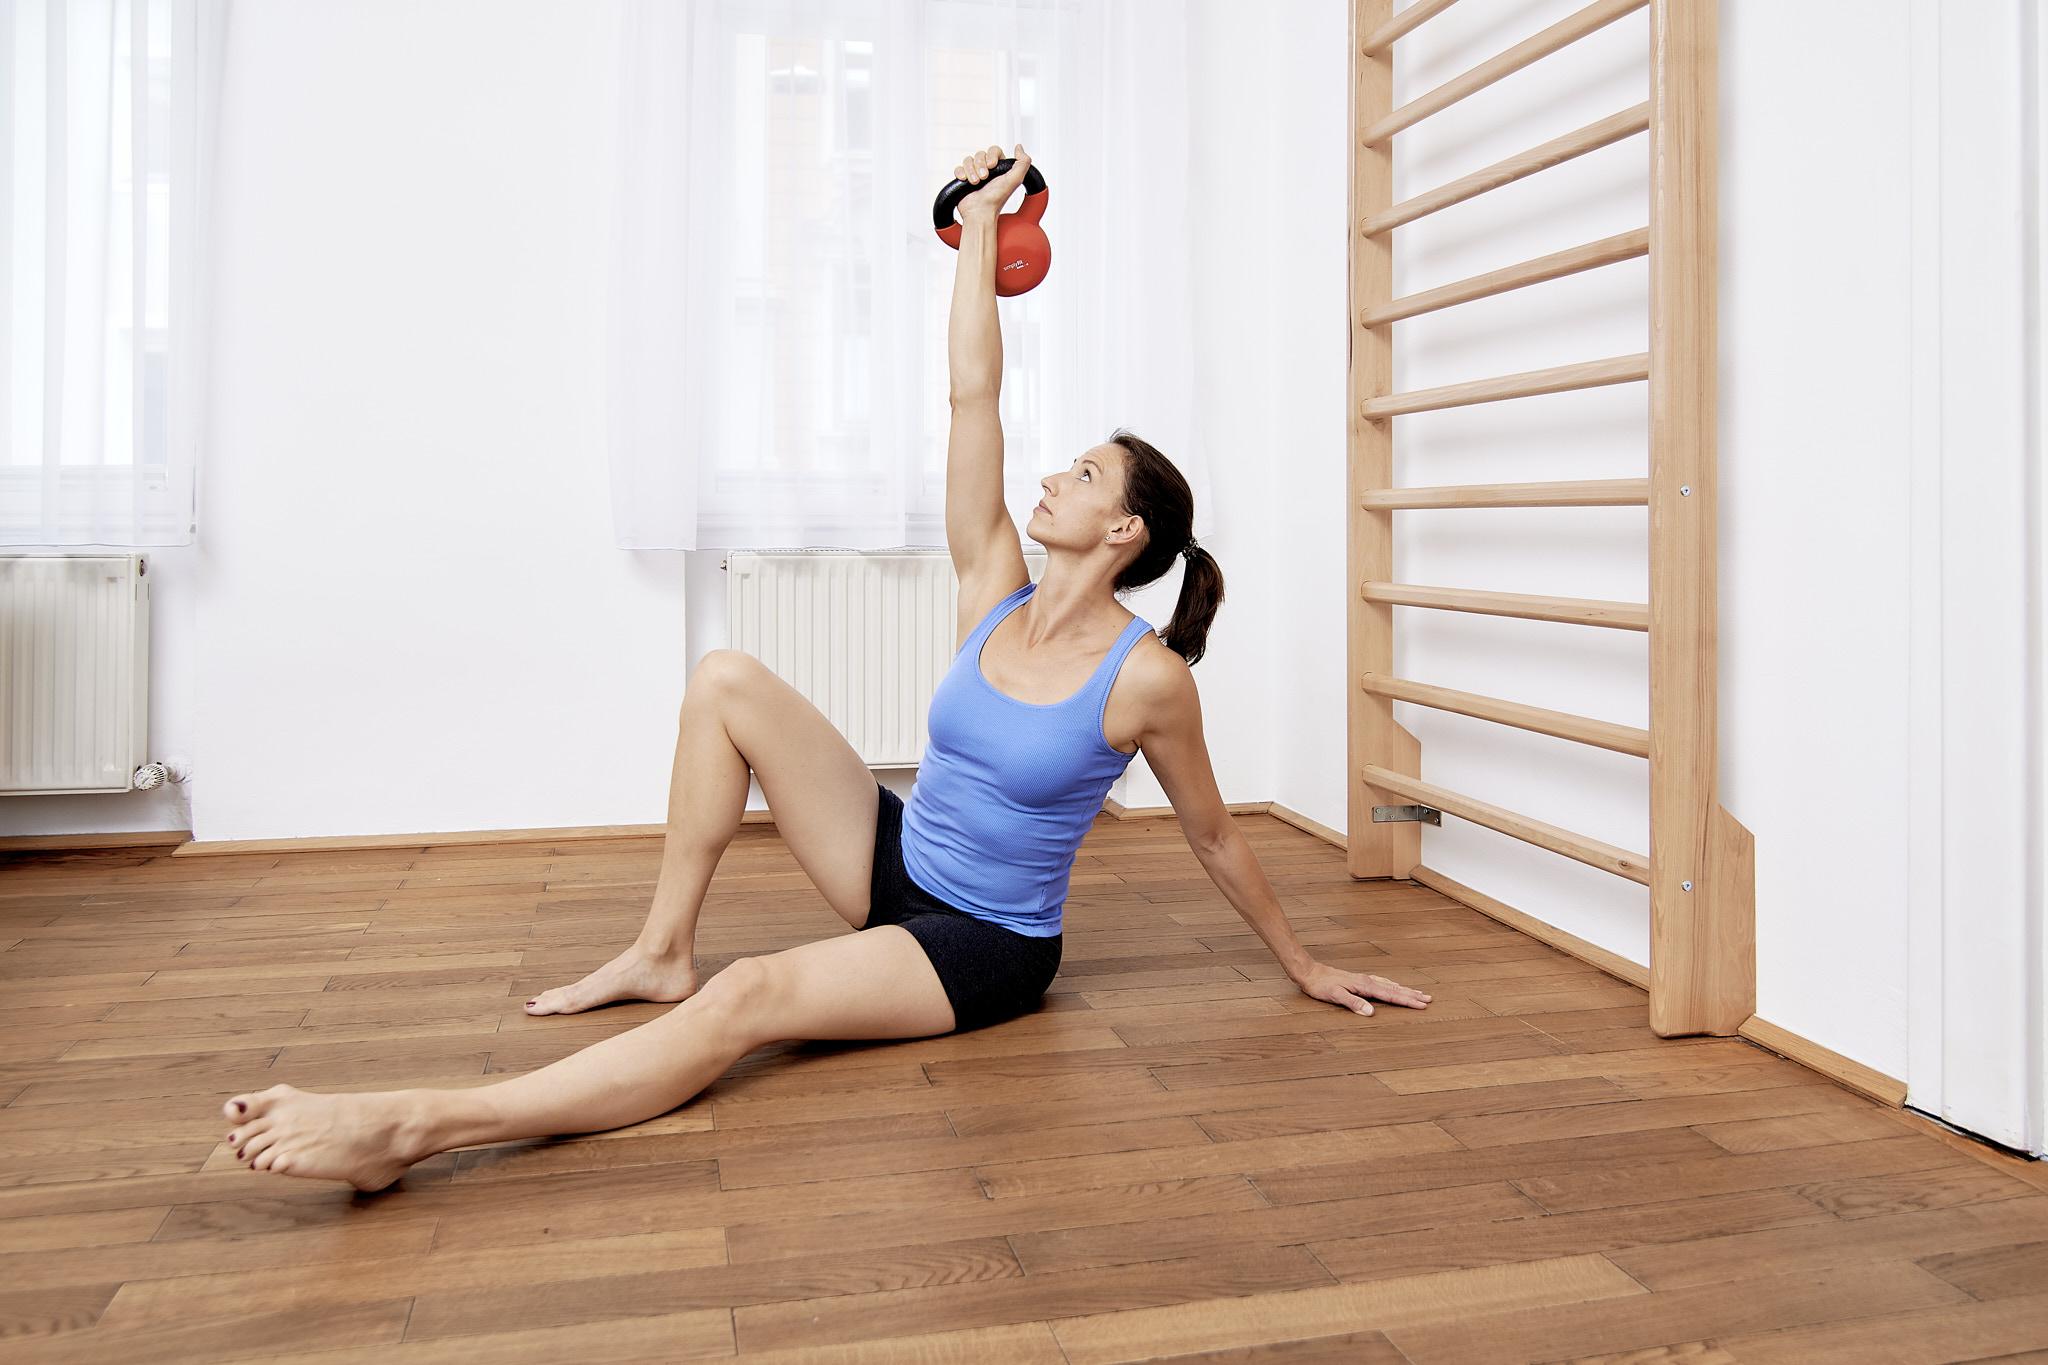 Sportphysiotherapie Schulter Physiotherapie Connert Innsbruck